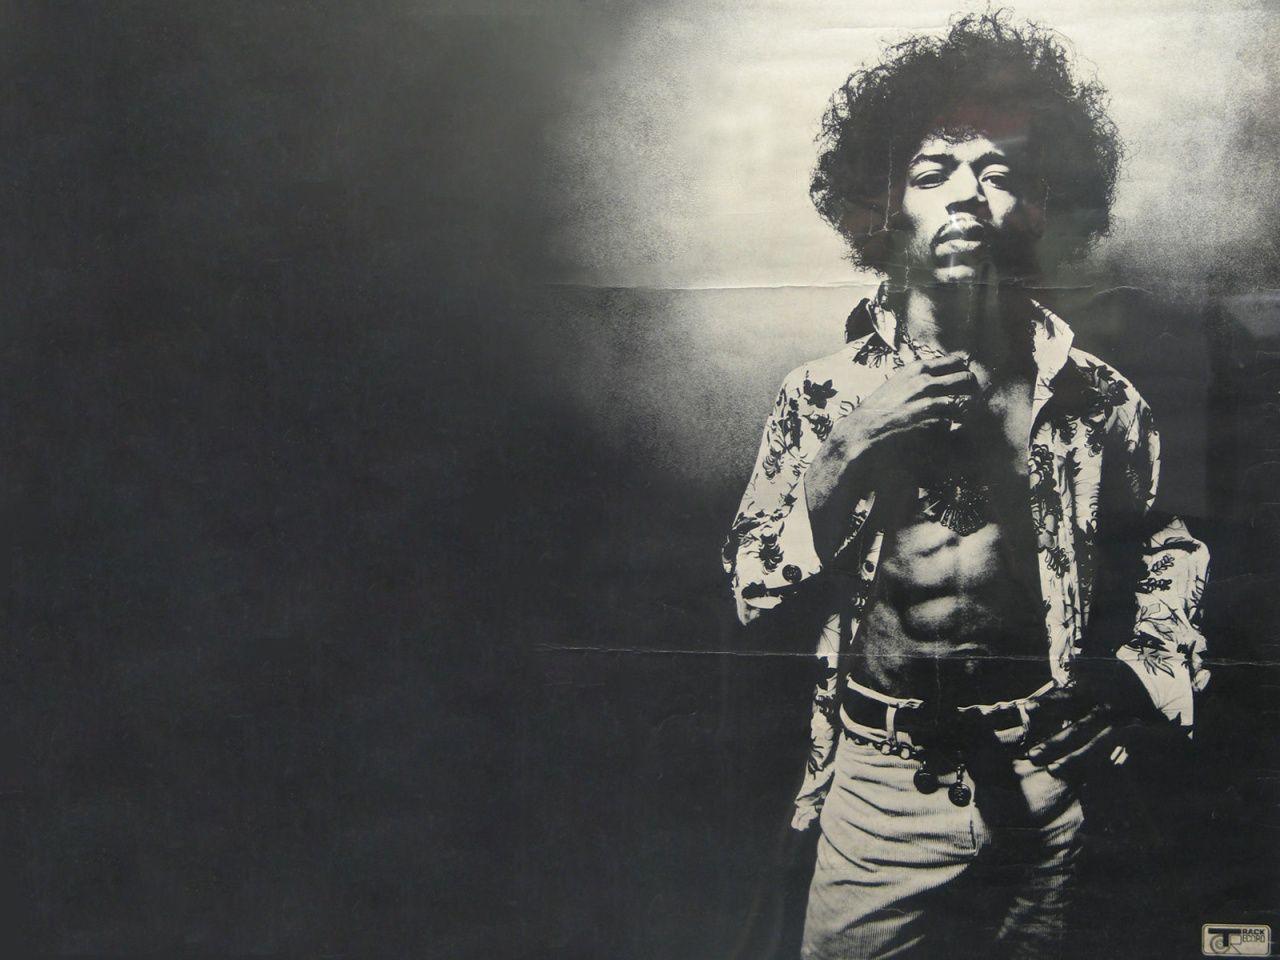 Jimi Hendrix Wallpaper WallpaperUP 1024x768 Wallpapers 36